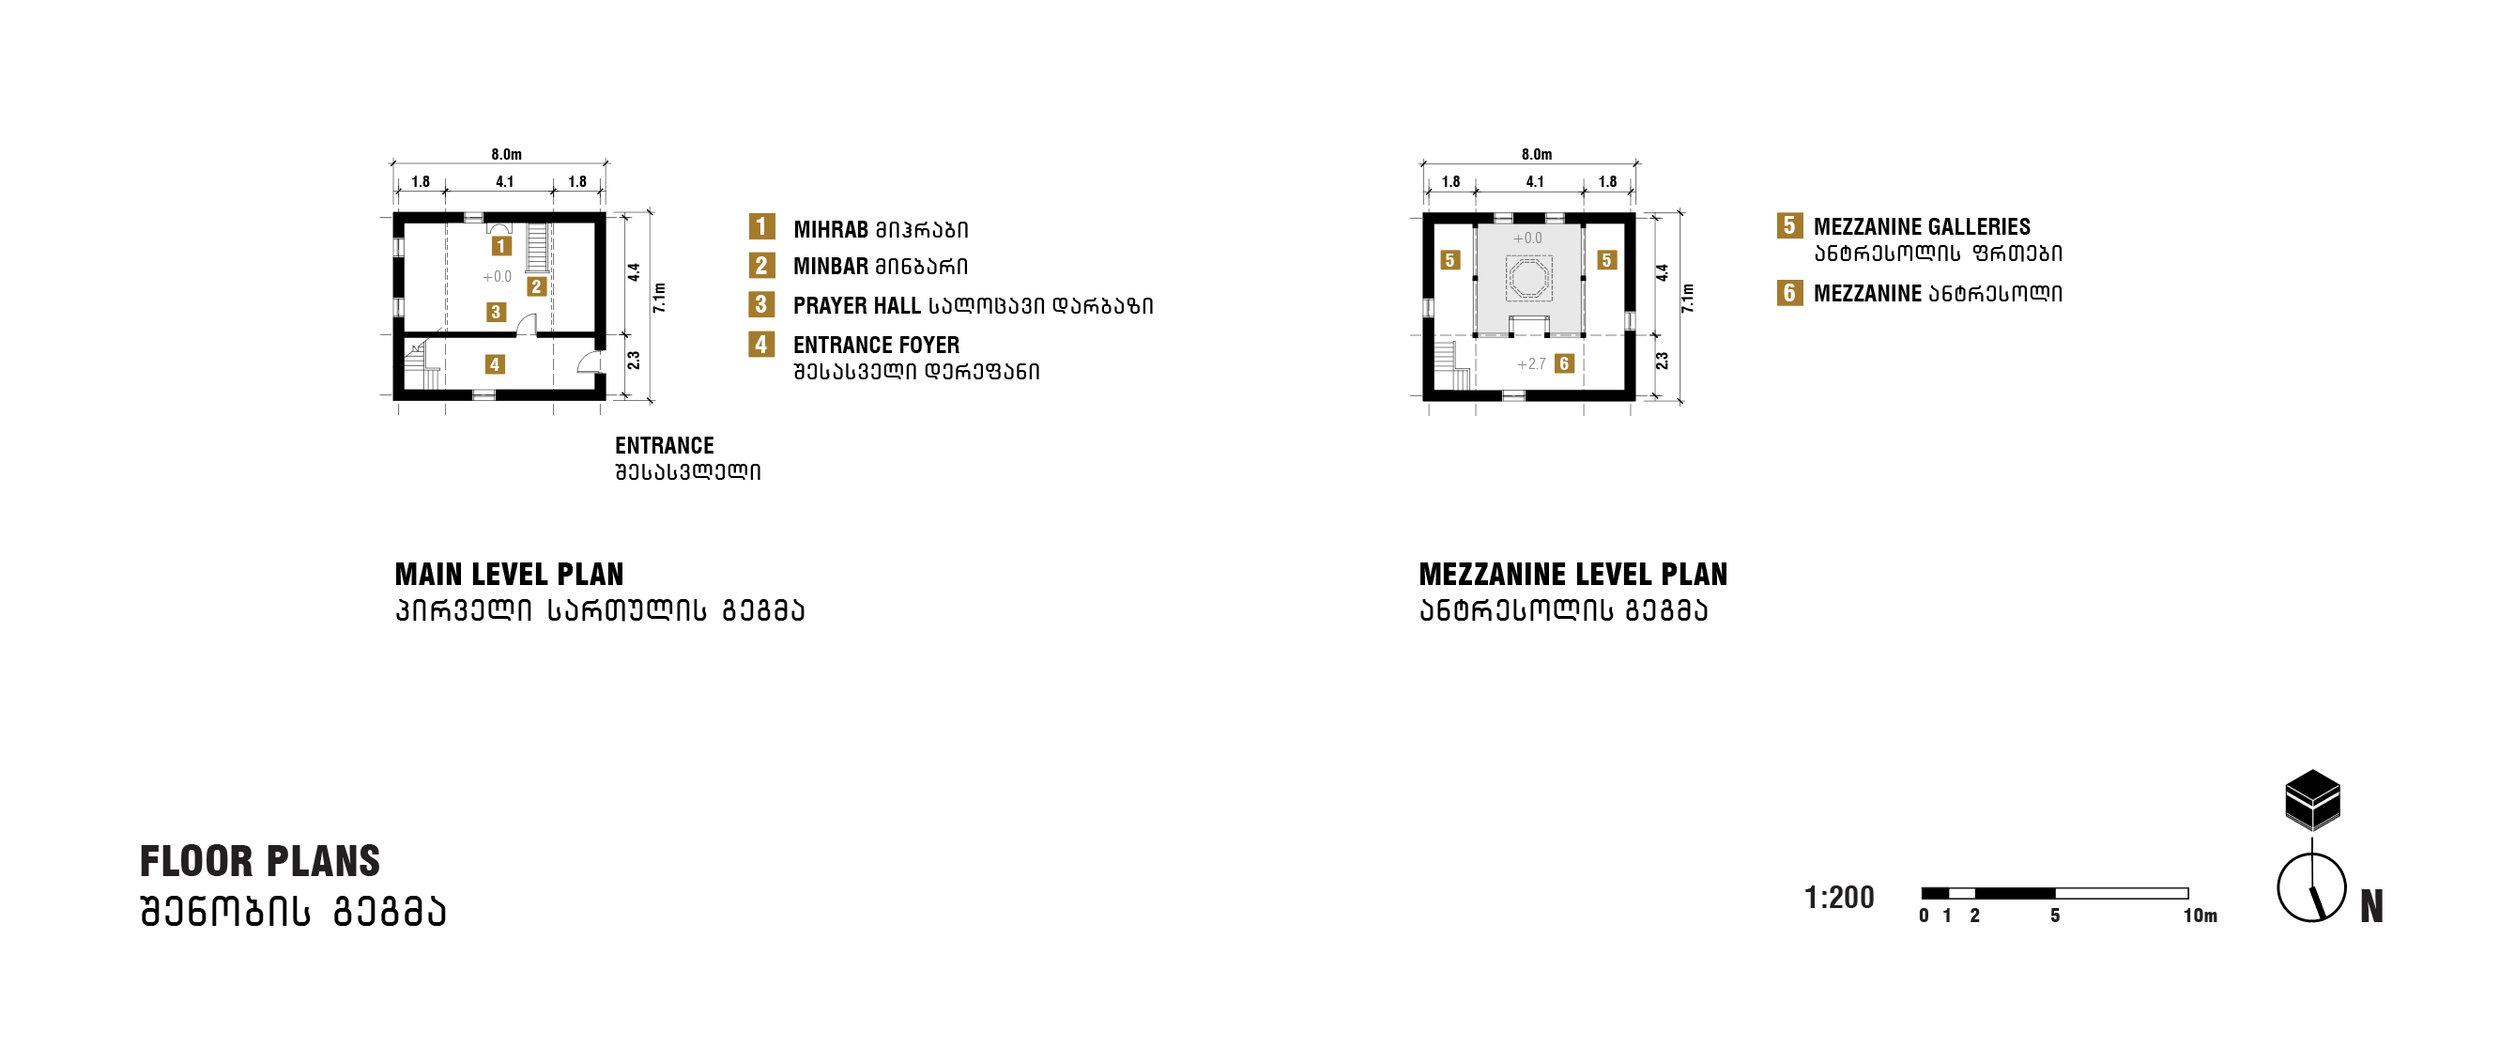 GOGINAURI_Floorplans 1-200.jpg